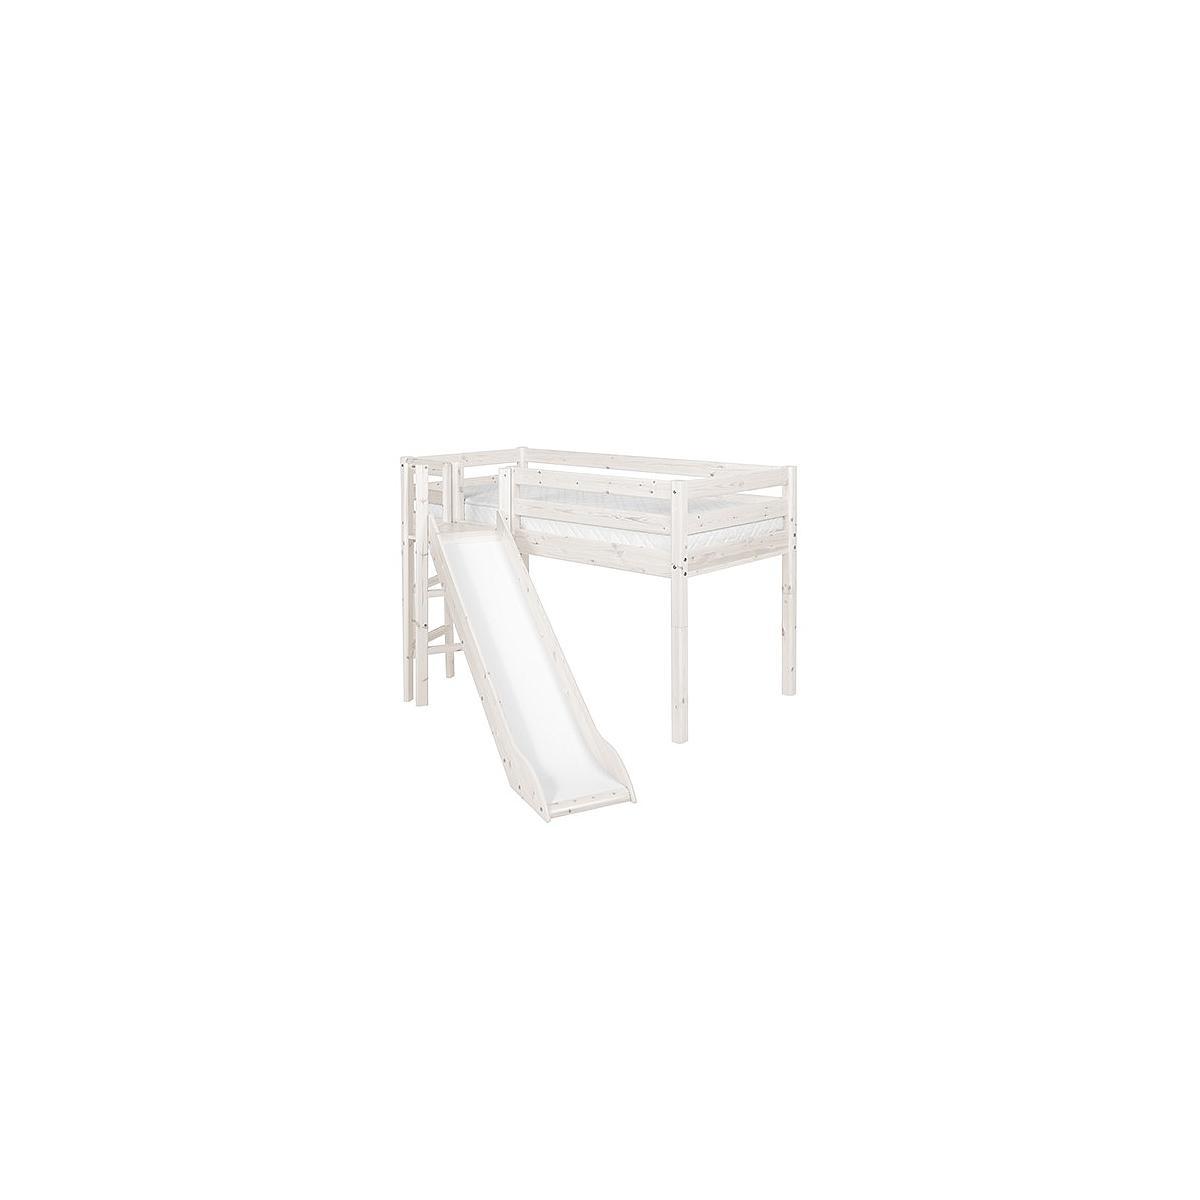 Cama media alta 90x190 CLASSIC Flexa plataforma y tobogán blanco cal